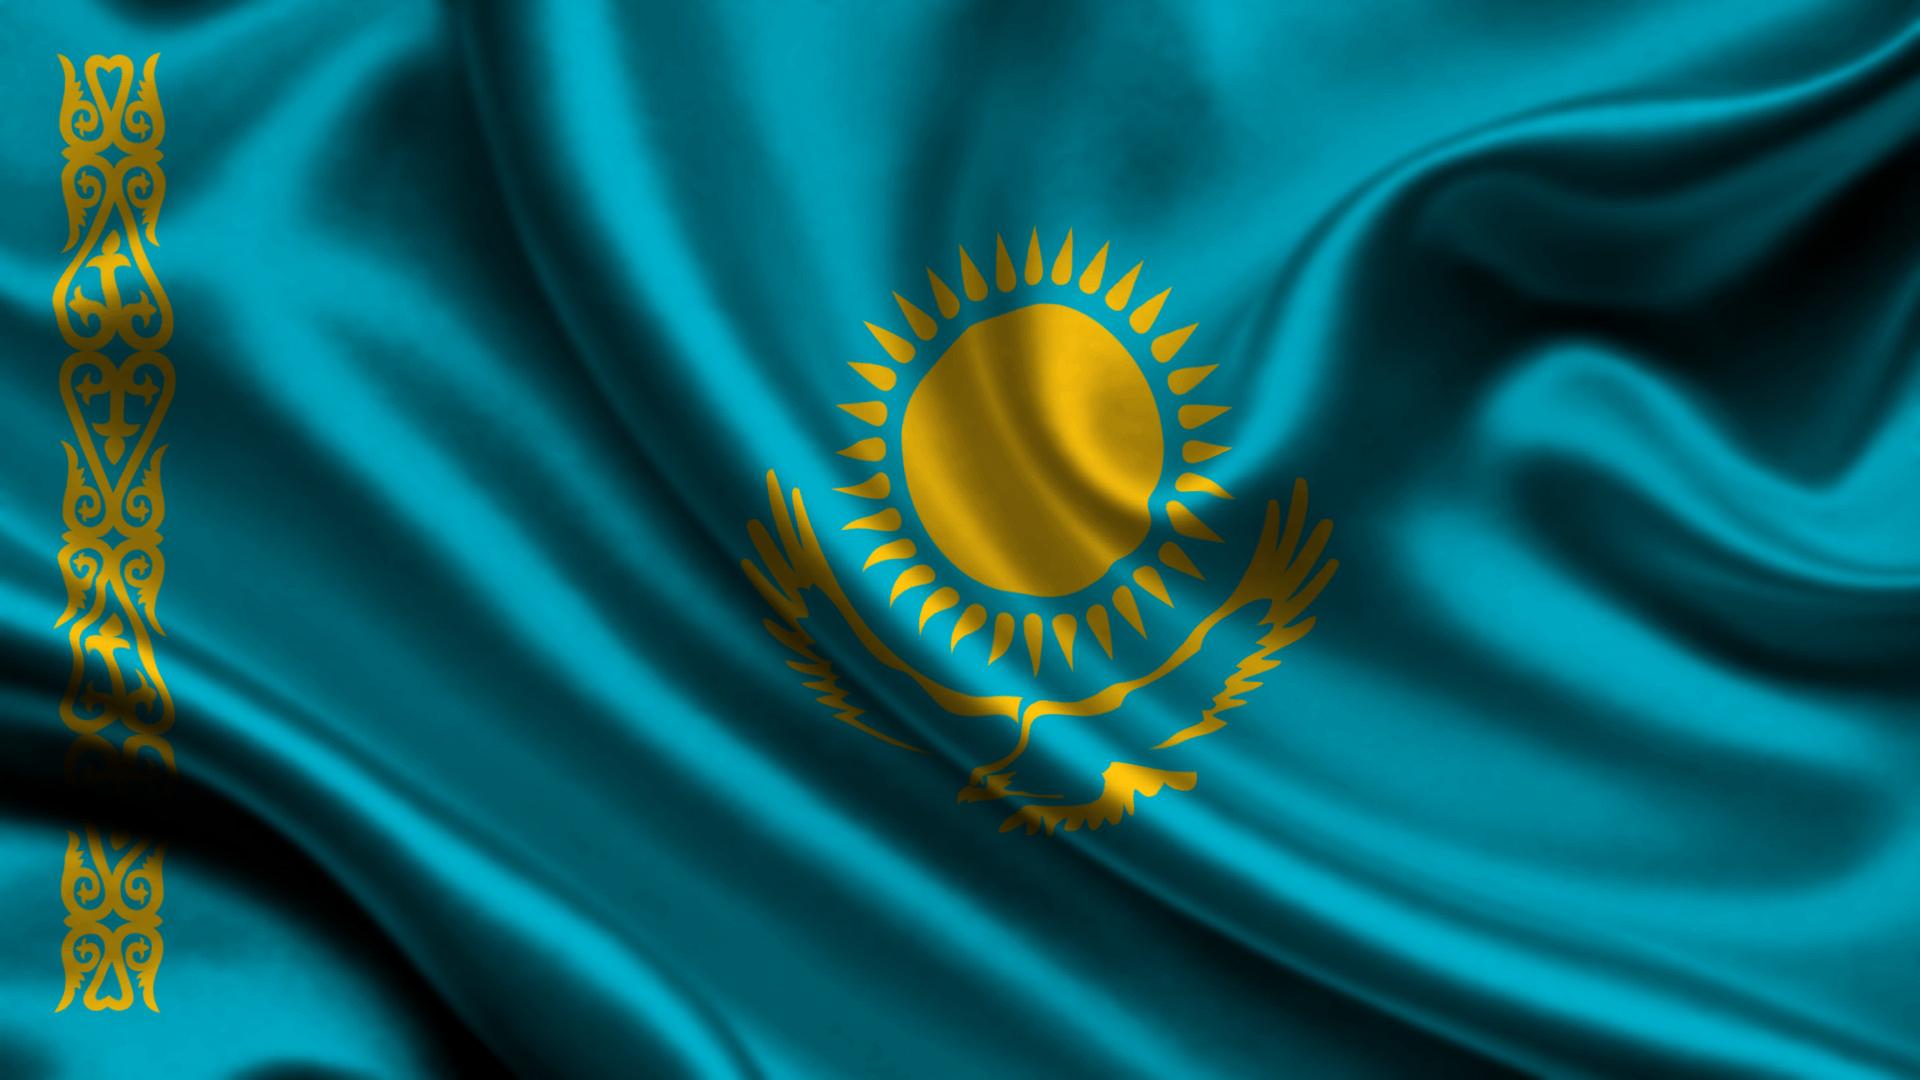 Флаг Казахстана - обои для рабочего ...: www.zastavki.com/rus/Backgrounds/wallpaper-41065.htm